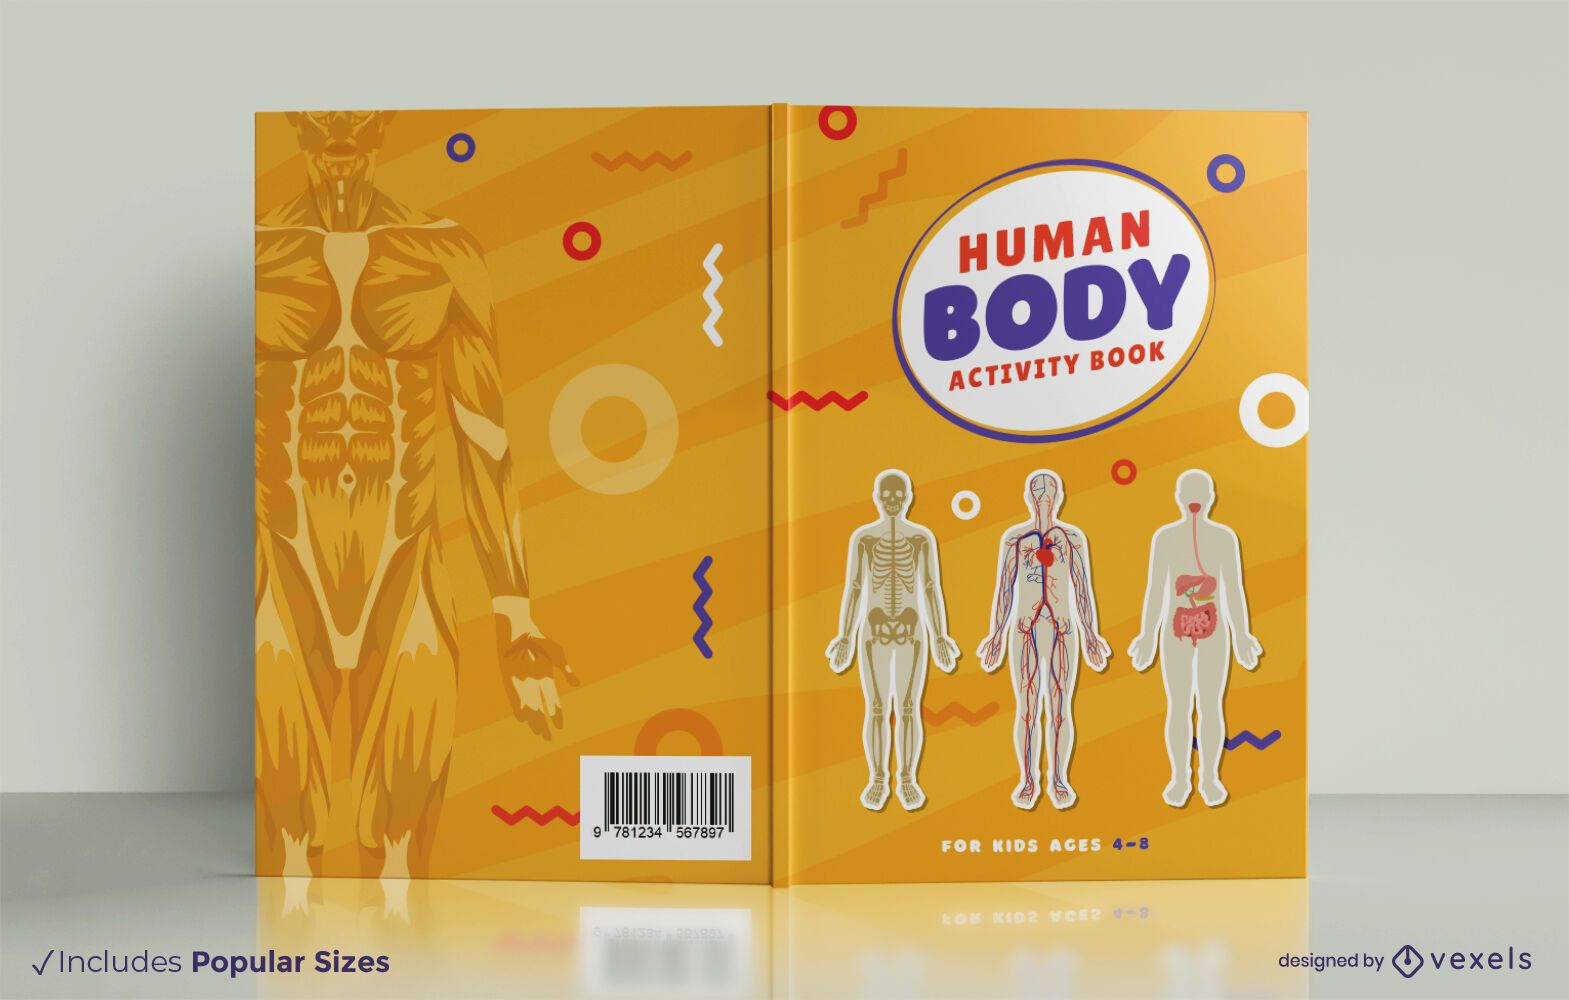 Human anatomy book cover design